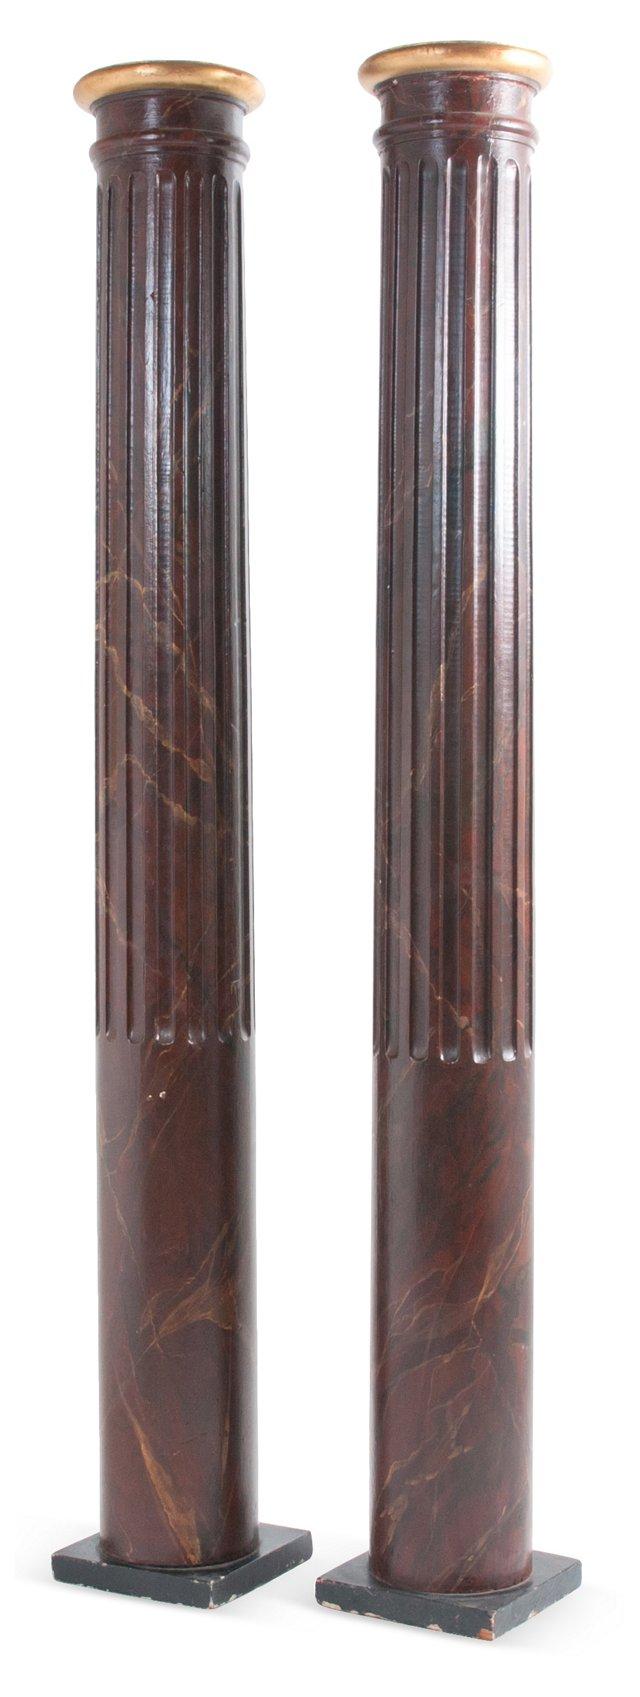 Large Painted Columns, Pair